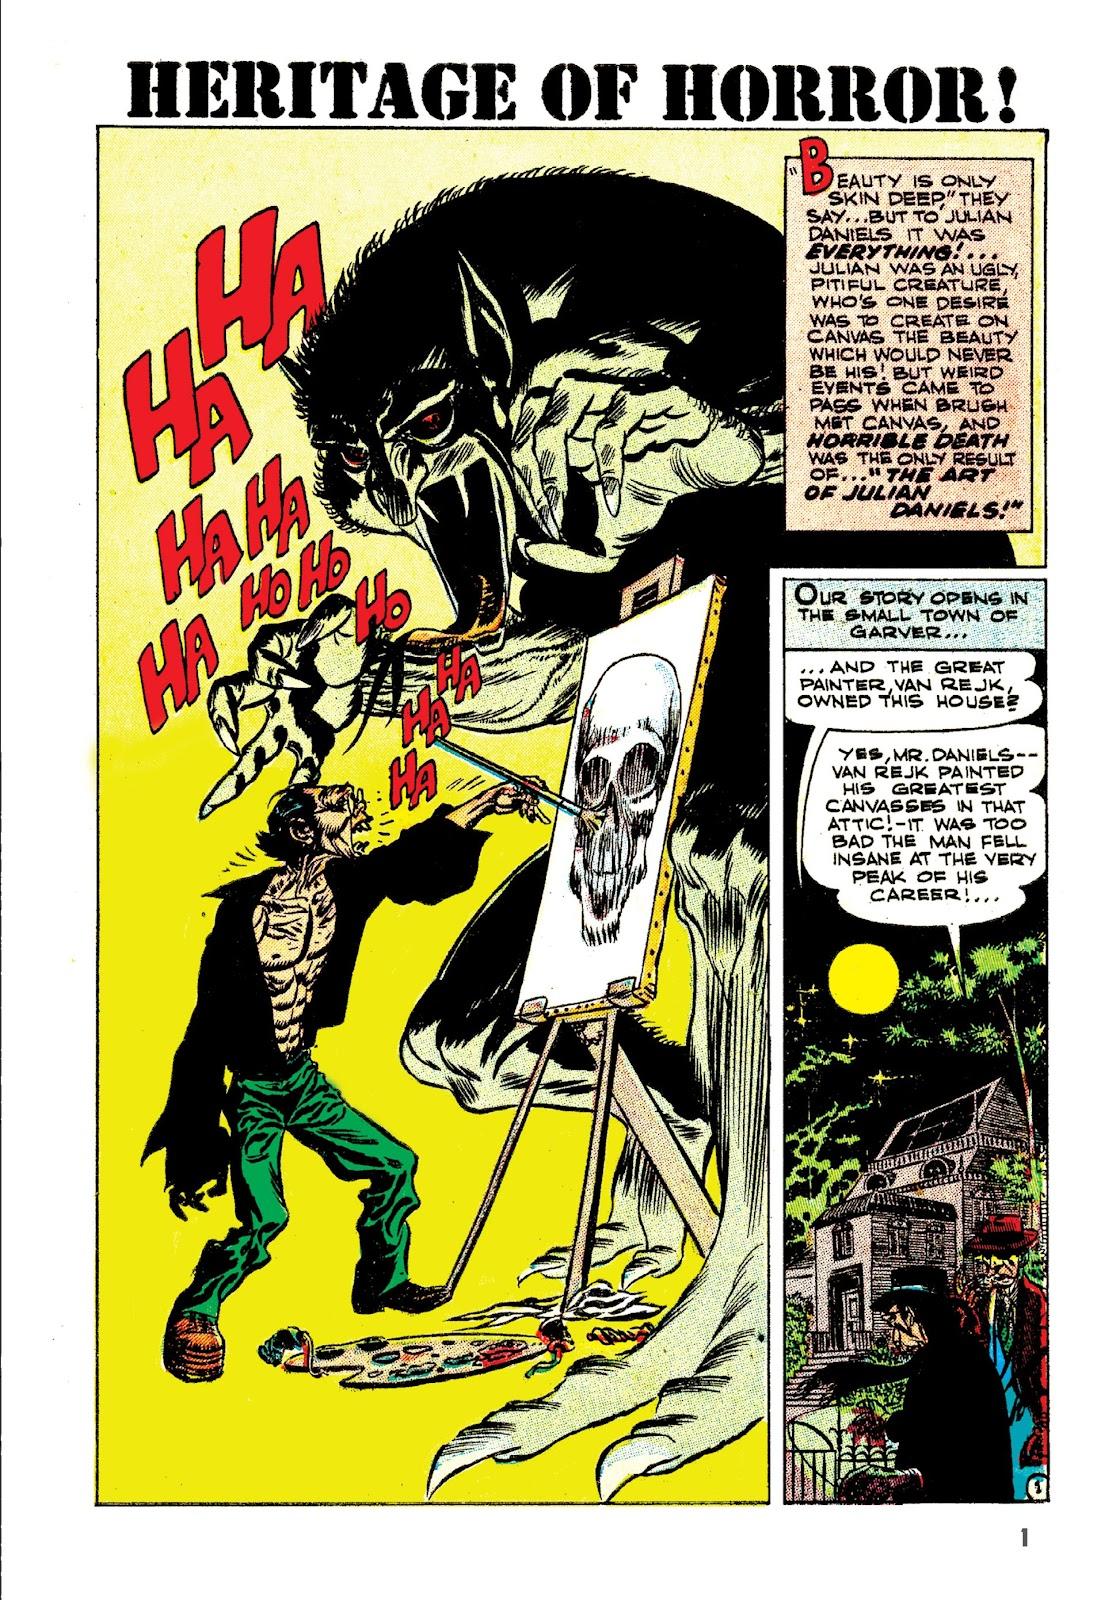 Read online The Joe Kubert Archives comic -  Issue # TPB (Part 1) - 12